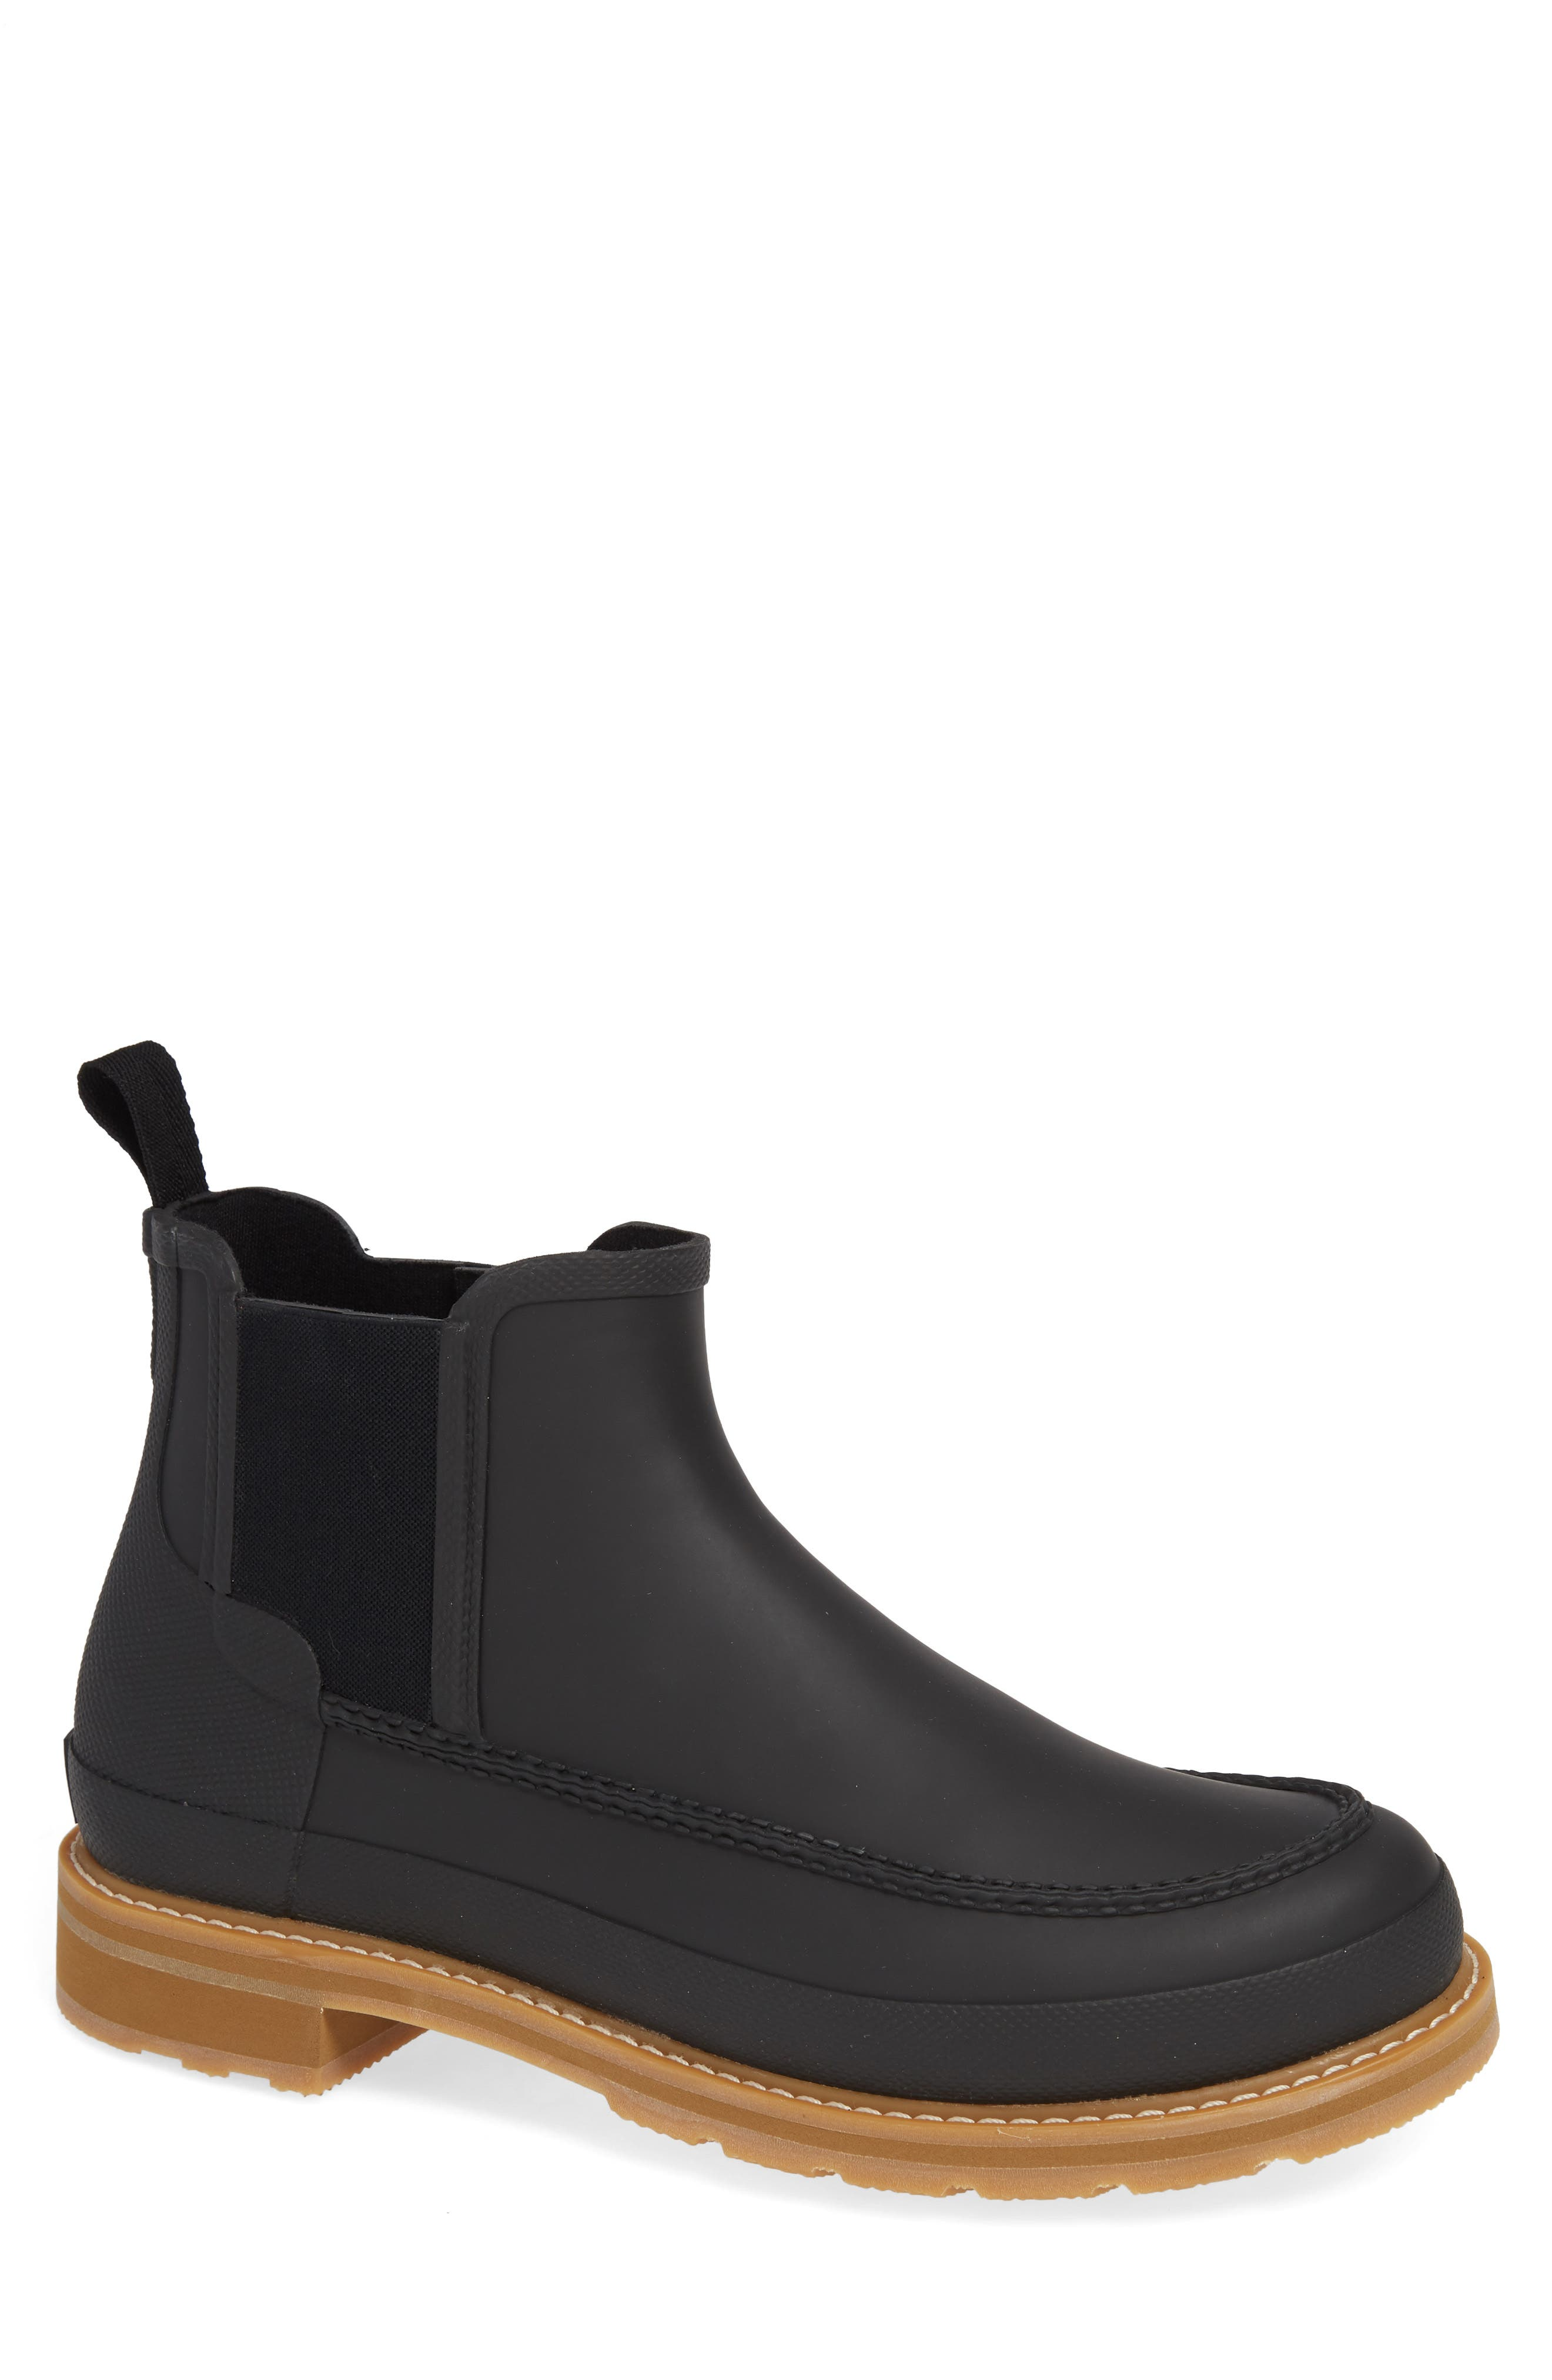 HUNTER Moc Toe Waterproof Chelsea Boot, Main, color, BLACK